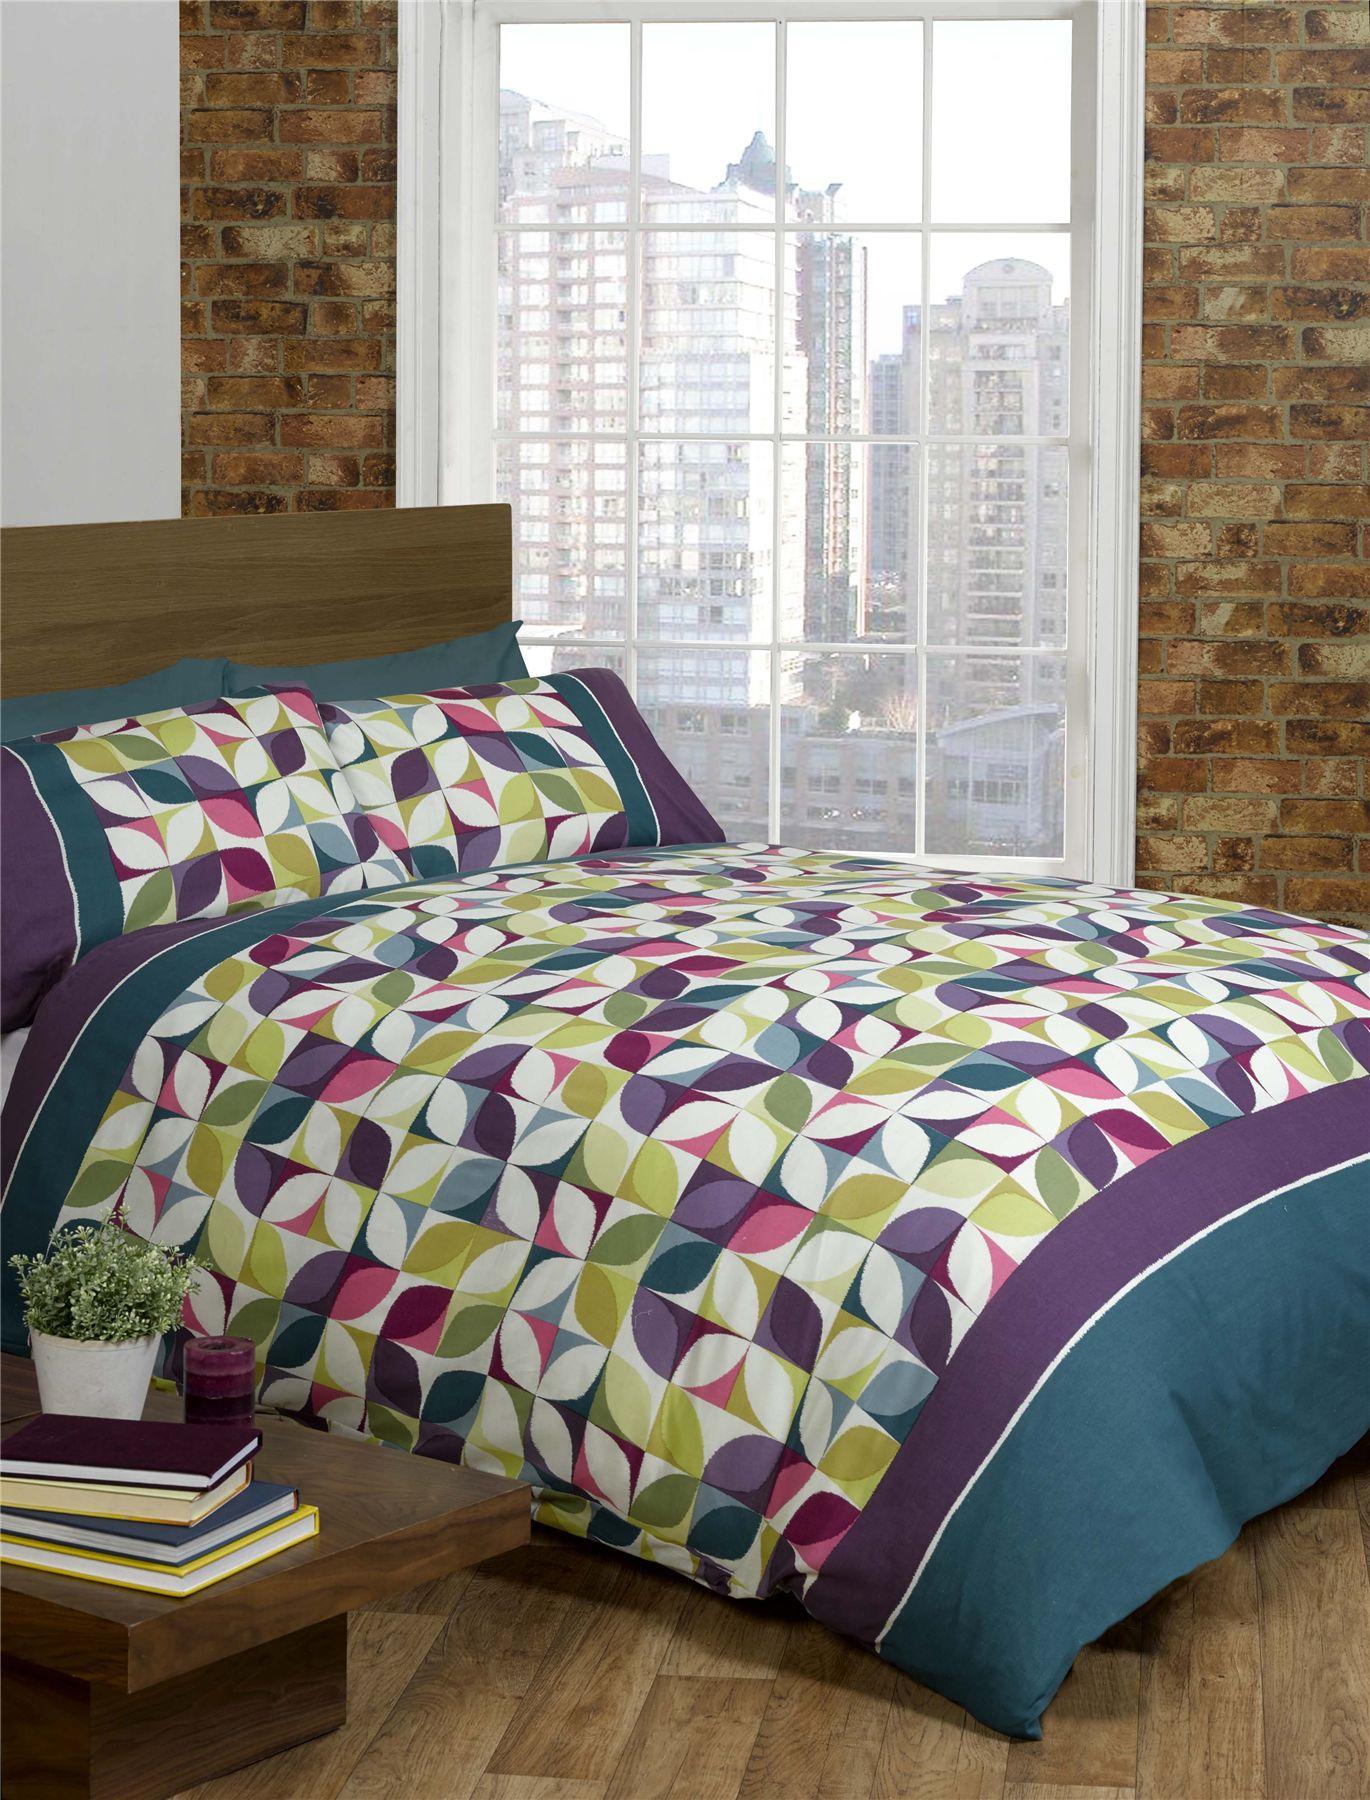 quilt duvet cover  pillowcase bedding bed set modern geometric  - quiltduvetcoveramppillowcasebeddingbedset